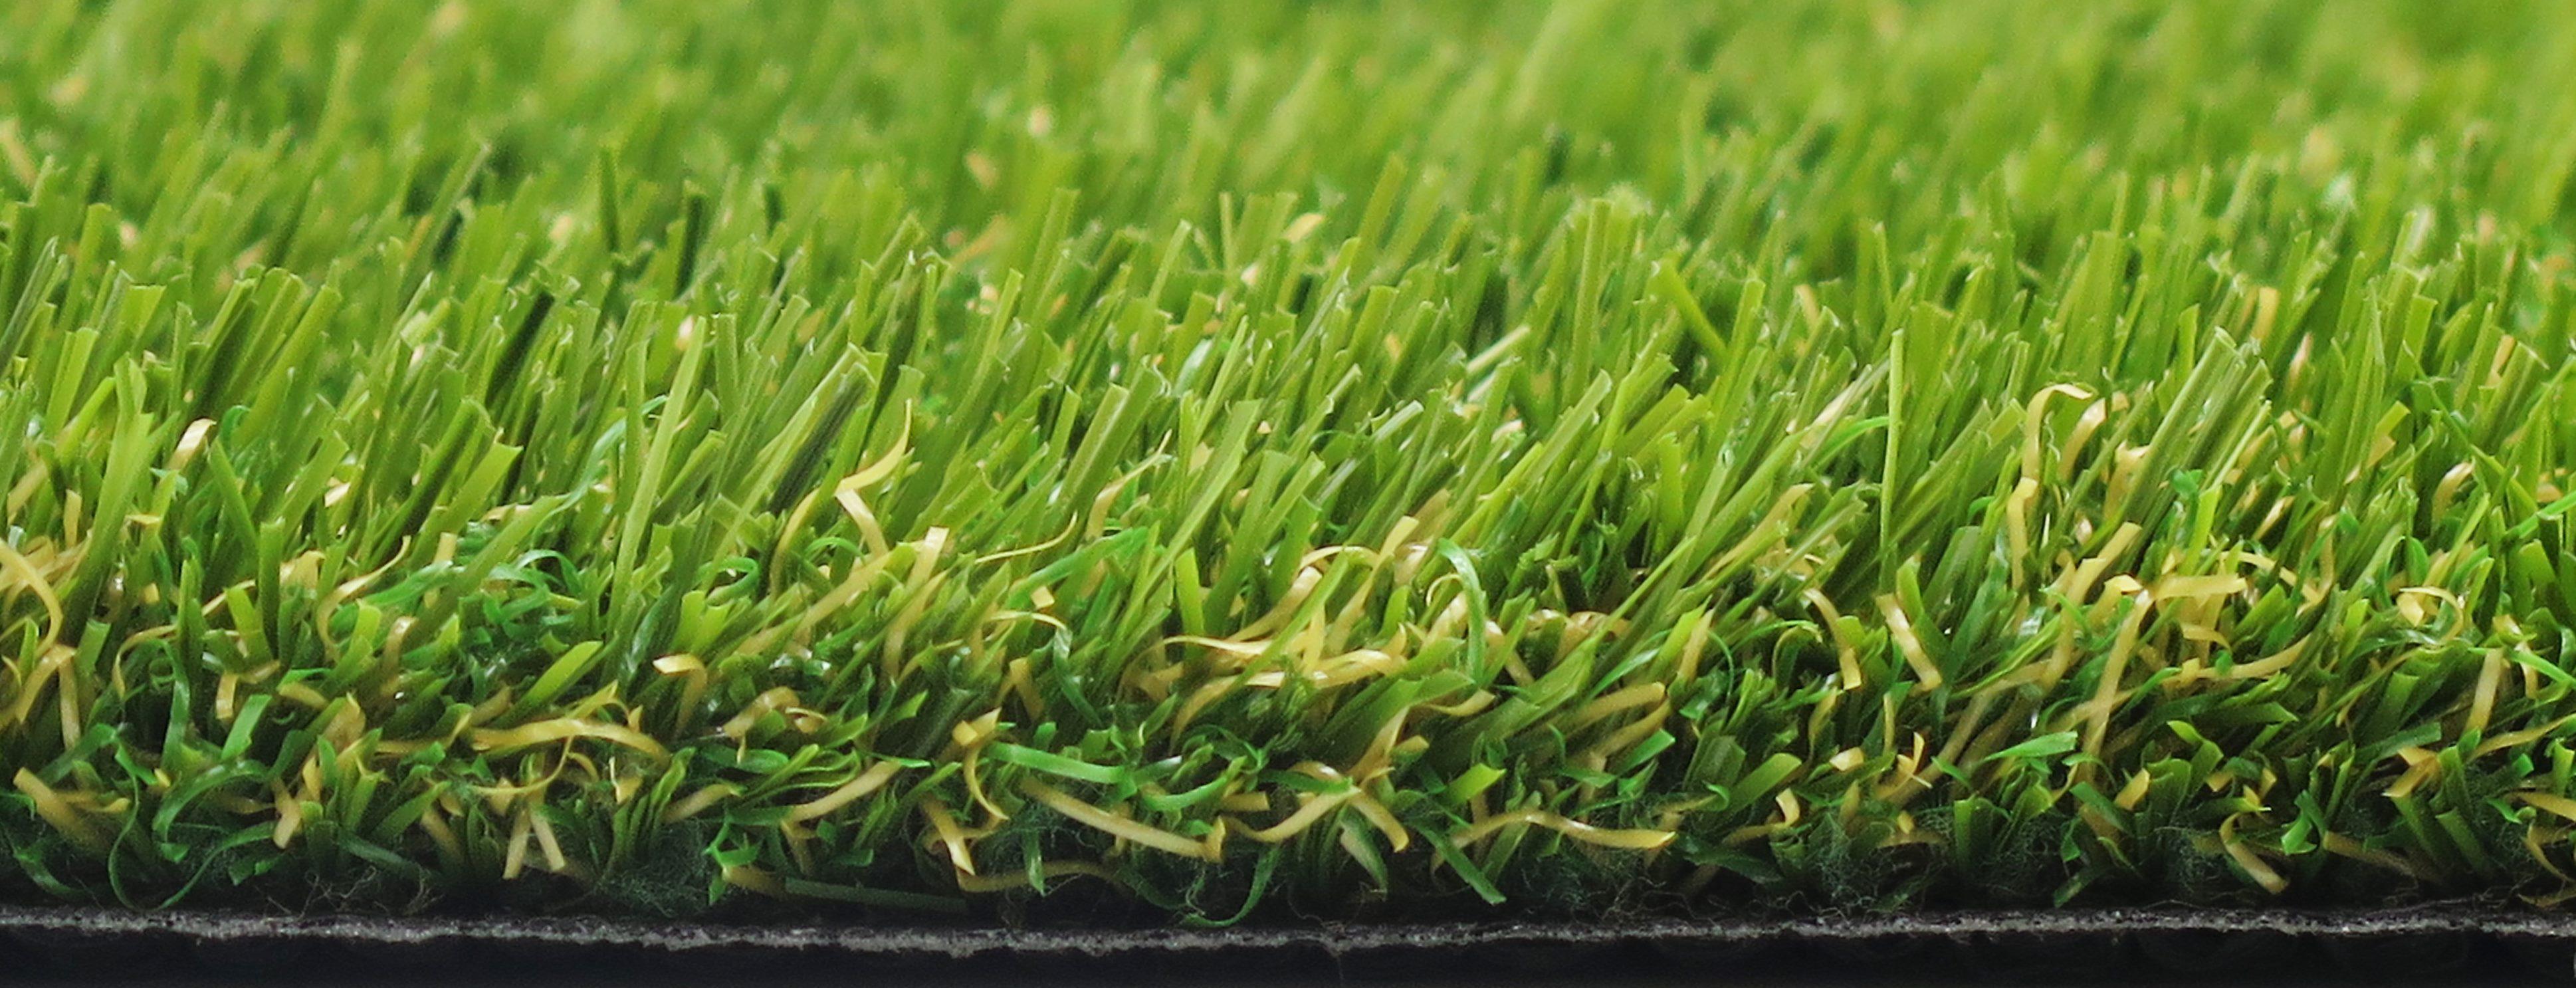 Luxury Sports Artificial Grass 2M